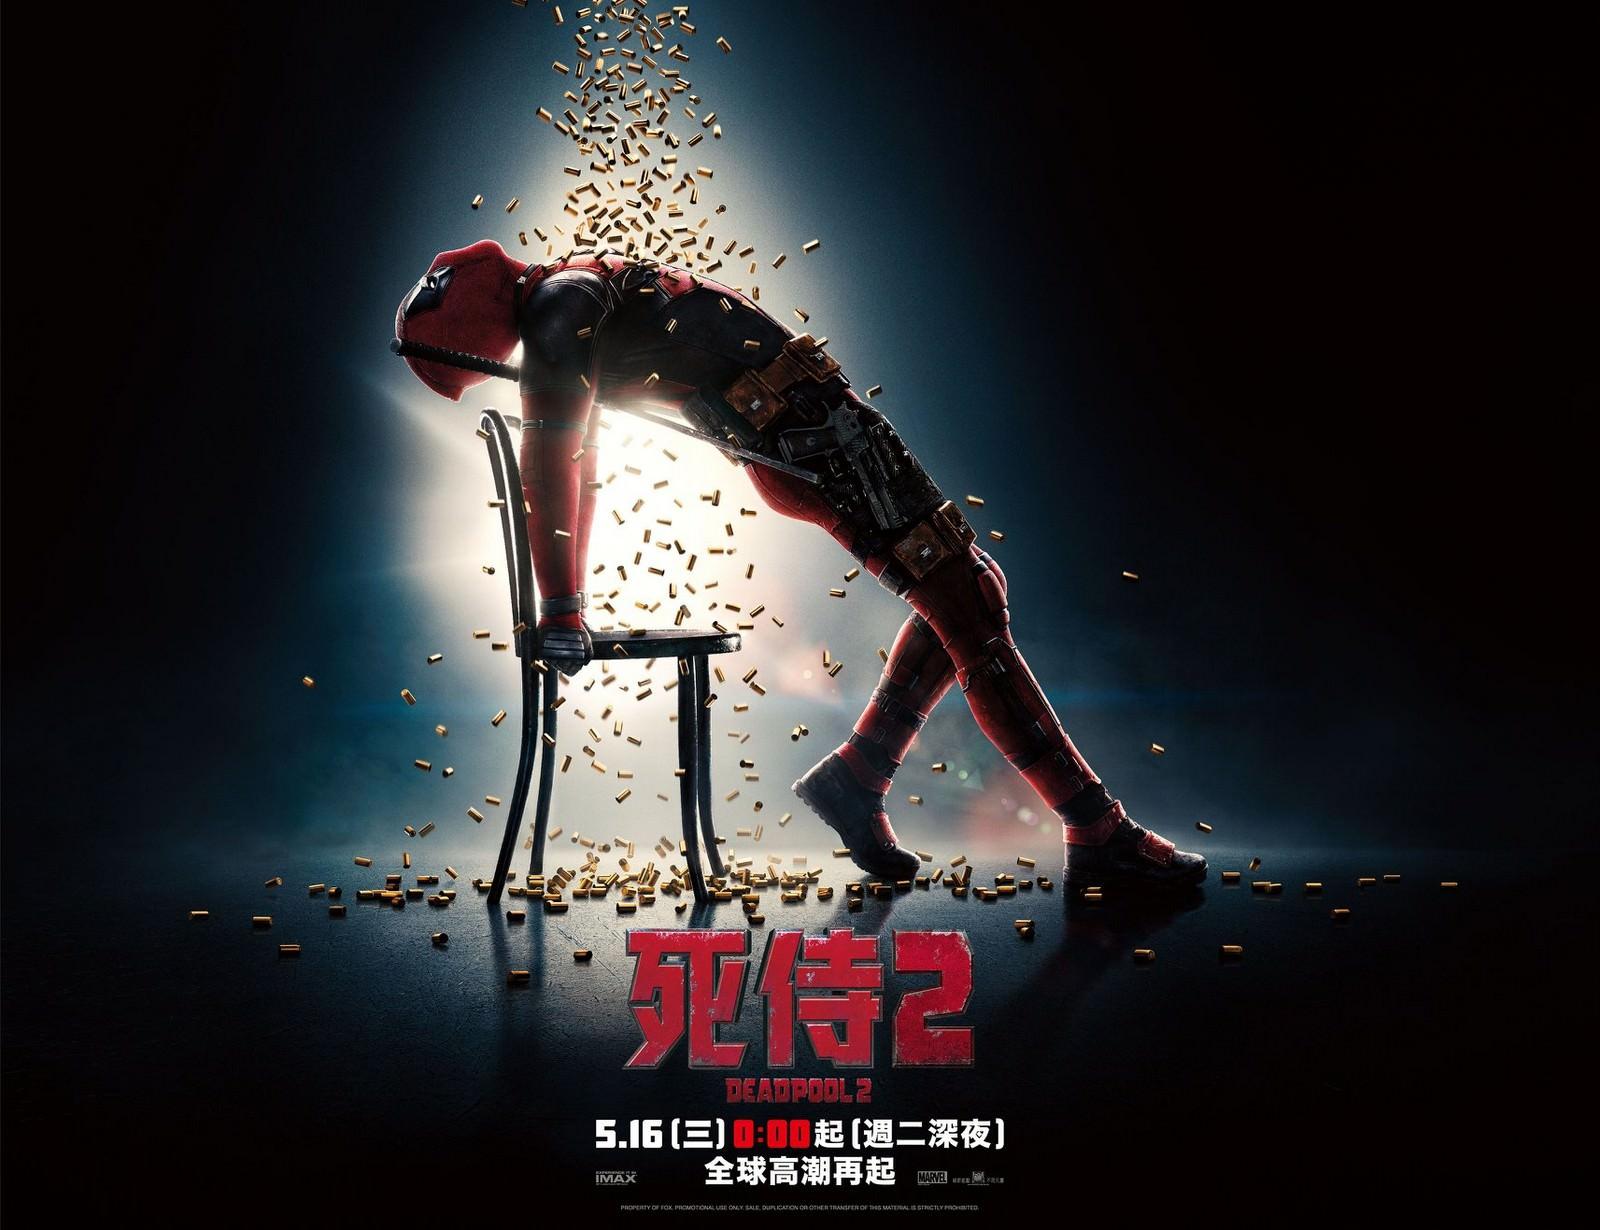 Movie, Deadpool 2(美國) / 死侍2(台.中.港), 電影海報, 台灣, 方版